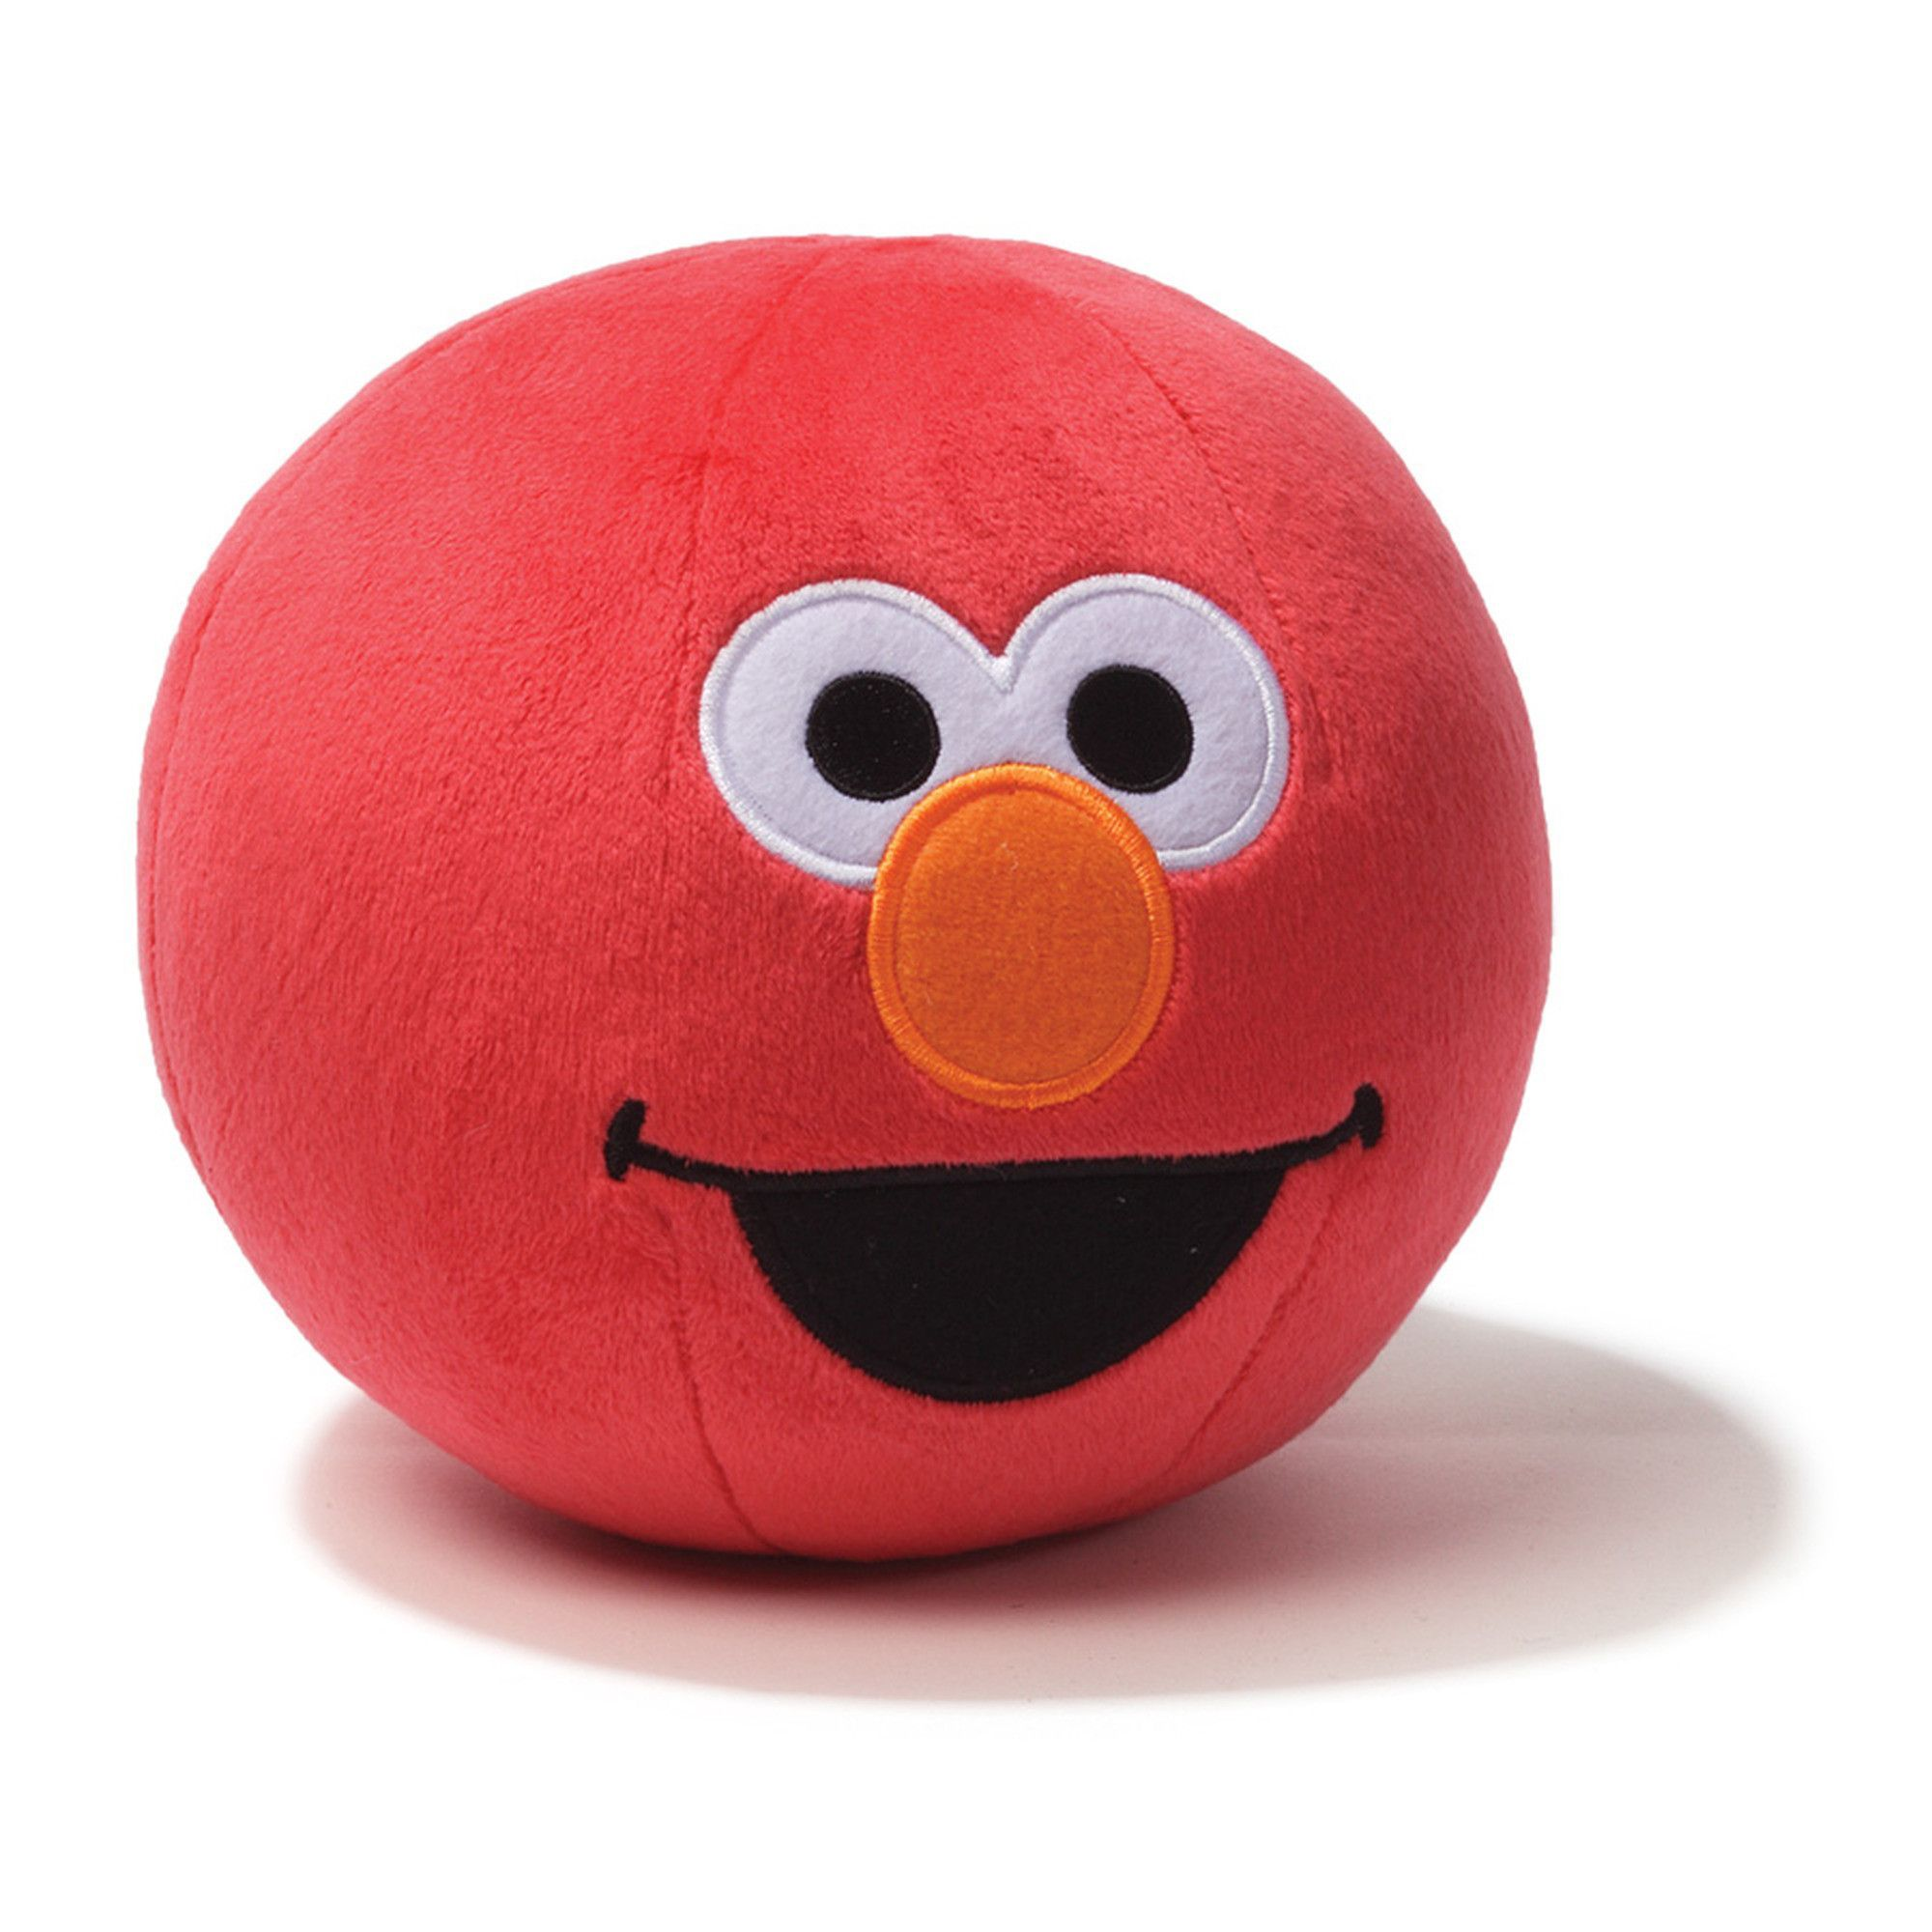 Sesame Street Elmo Chime Ball